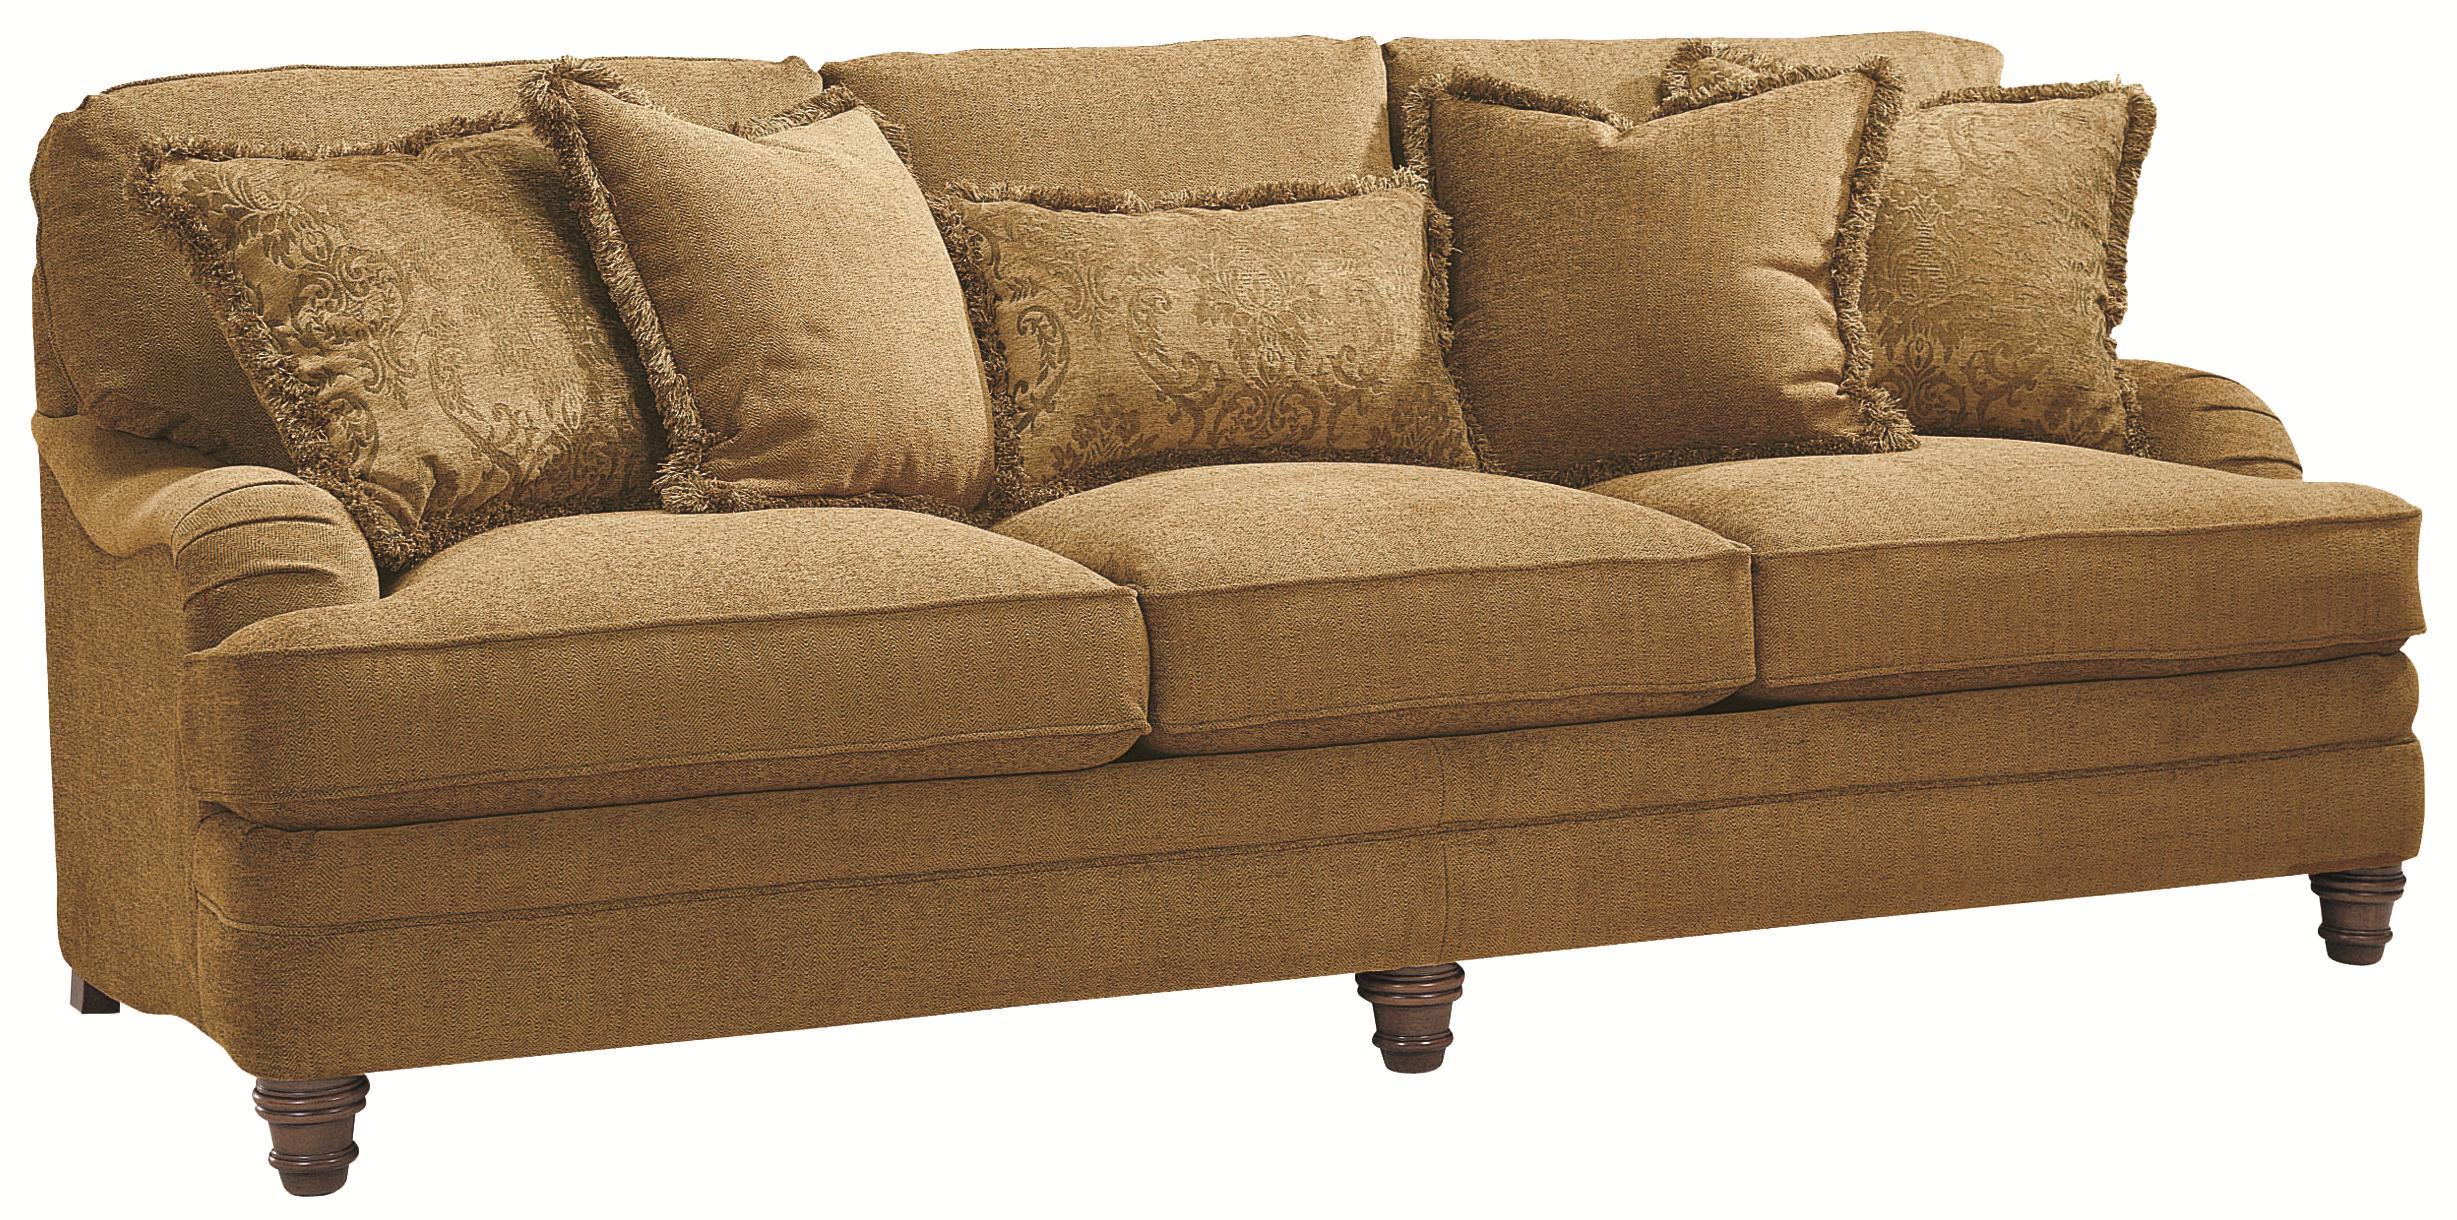 bernhardt sofas unique sectional sofa tarleton traditional styled stationary wayside